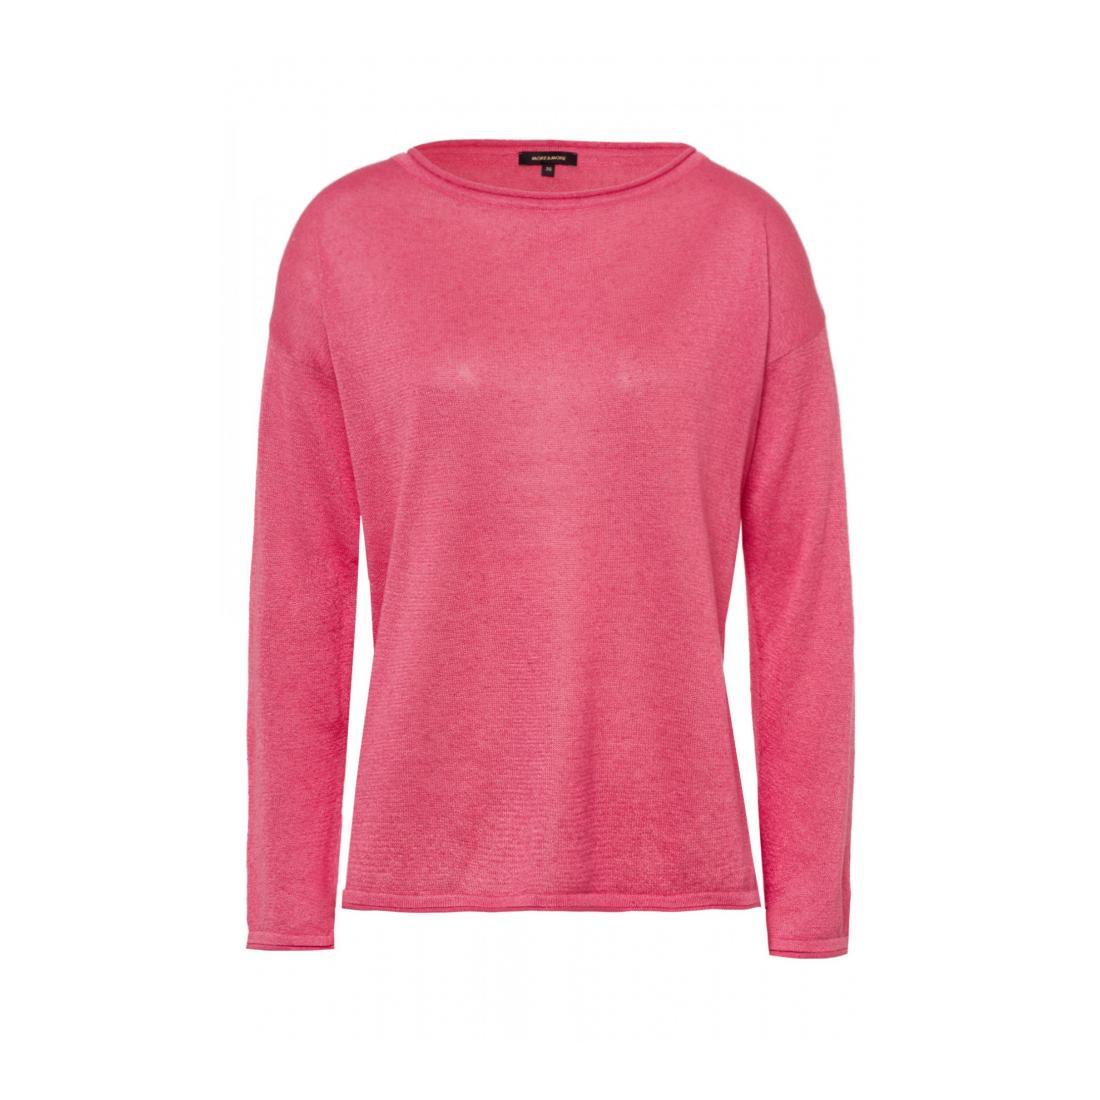 More & More Pullover Damen Linen Blend Pullover Acti